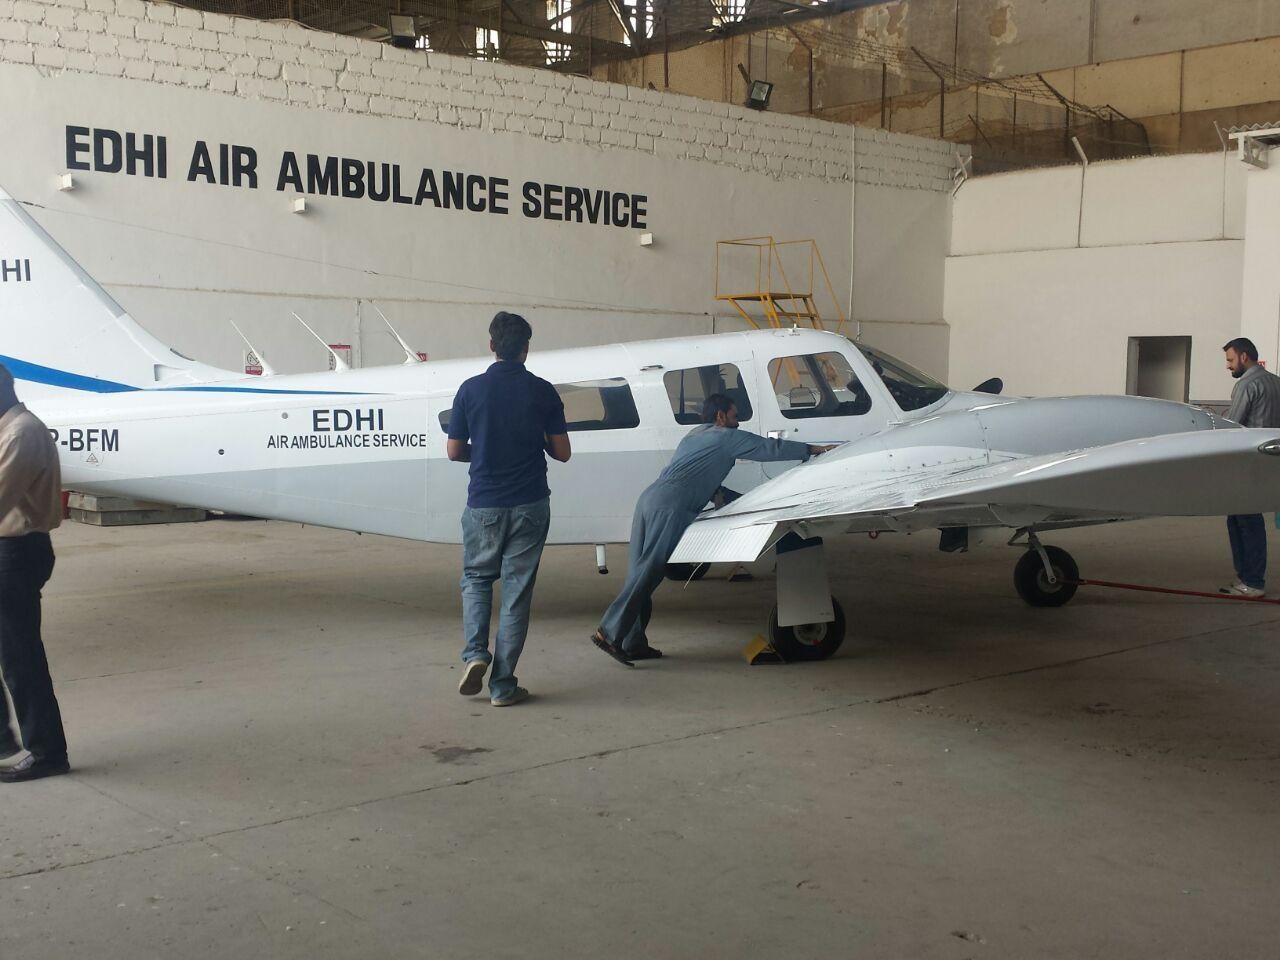 The death of their chief pilot Captain Imtiaz three years back was the reason behind shutting down the Edhi Air Ambulance Service. PHOTO: COURTESY FAISAL EDHI